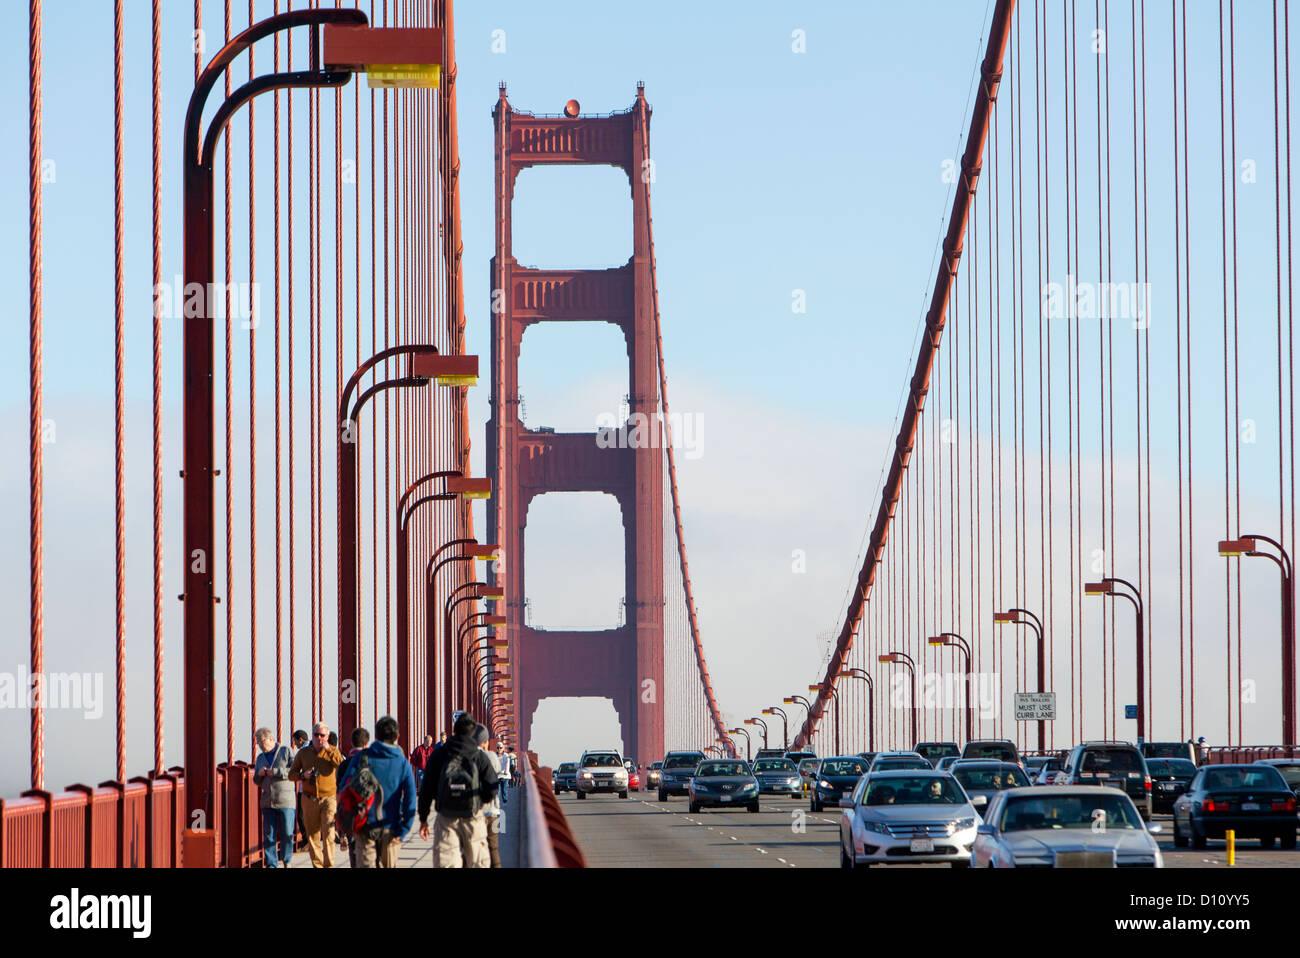 The San Francisco Golden Gate Bridge Pedestrians Walking Across The Bridge And Cars Driving Across Stock Photo Alamy